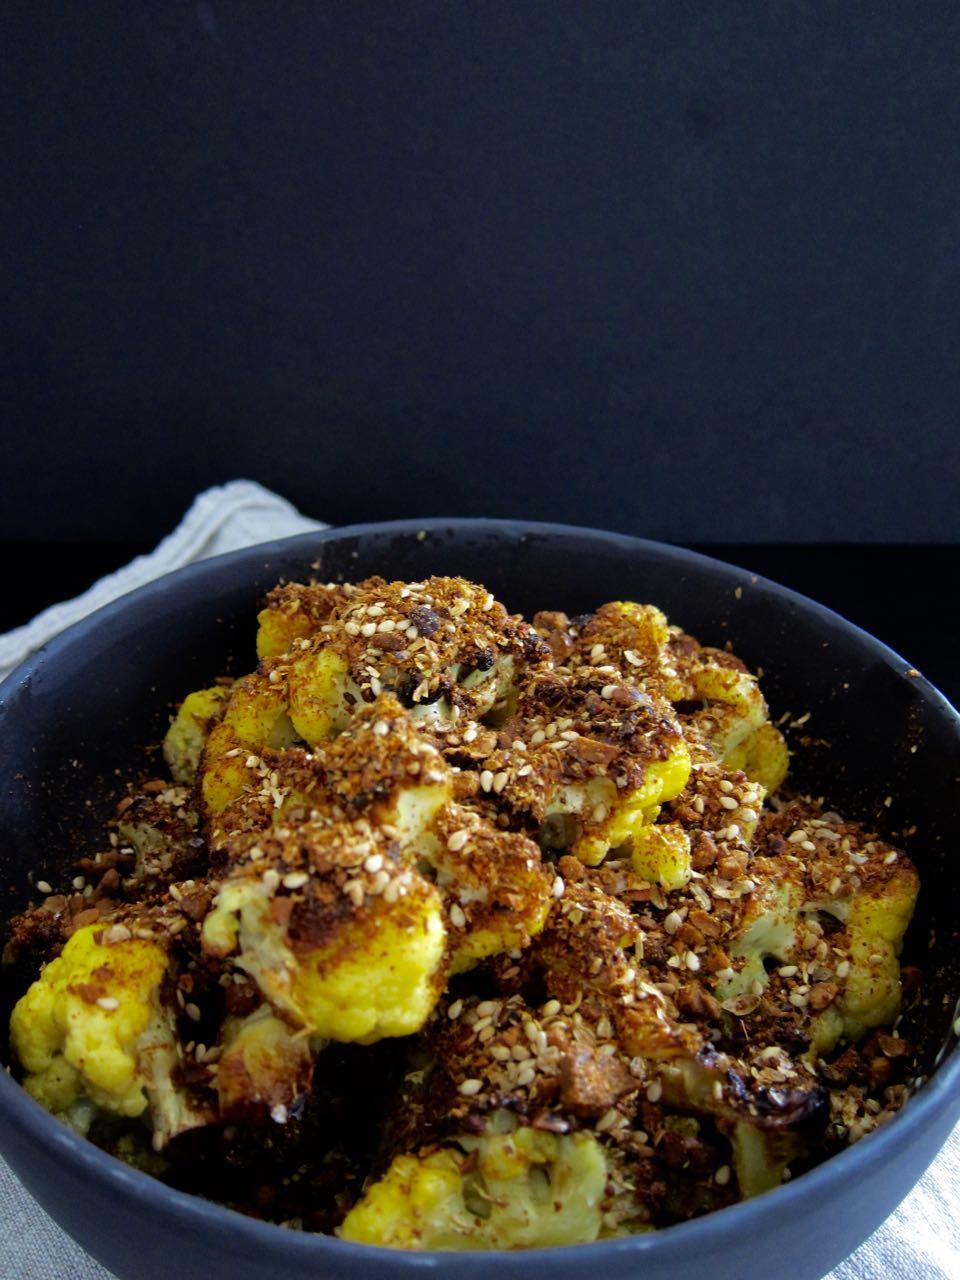 Fried Cauliflower with Dukkah